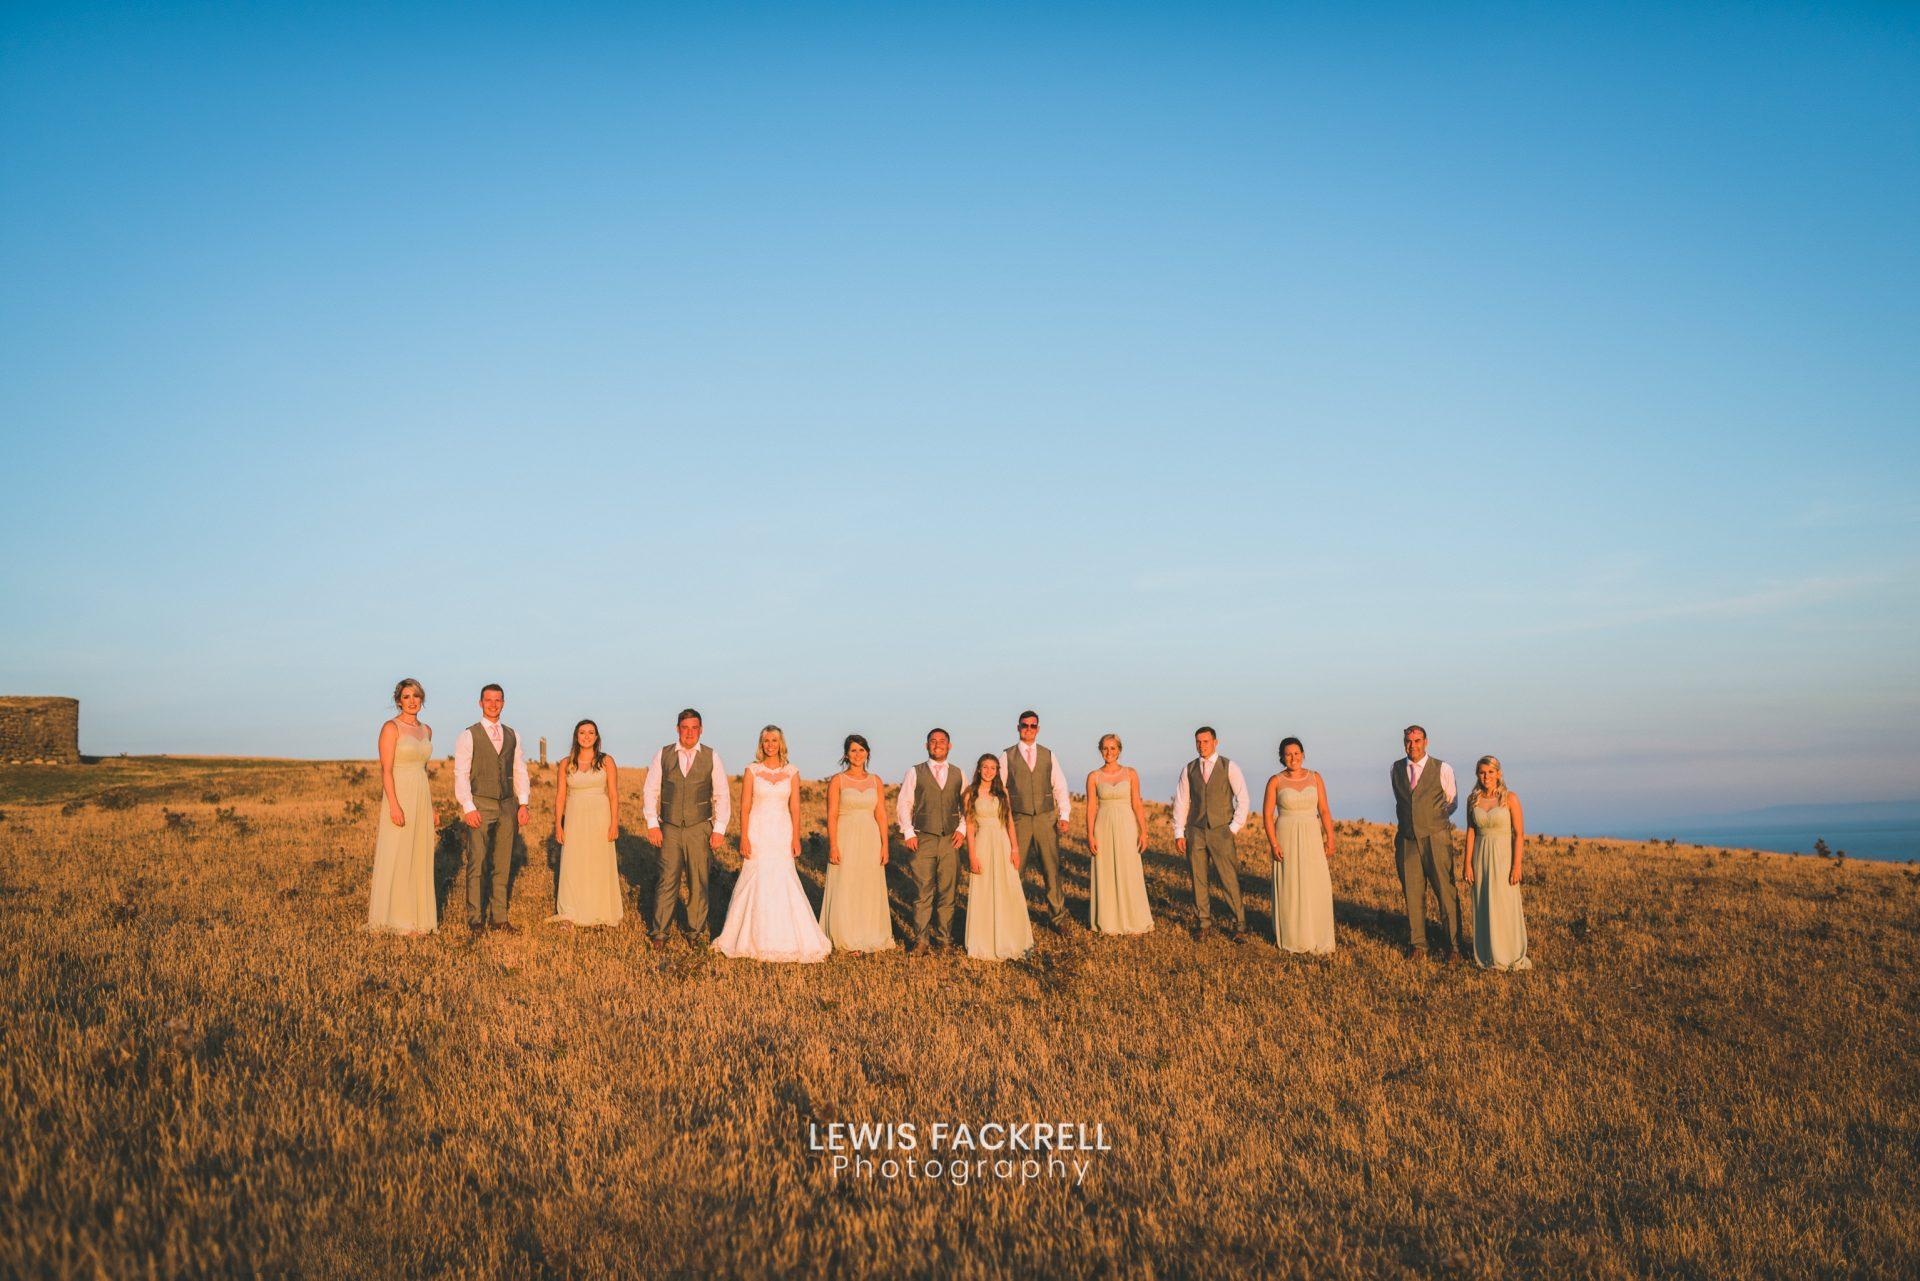 Wedding formal group photos of bridesmaids and groomsmen